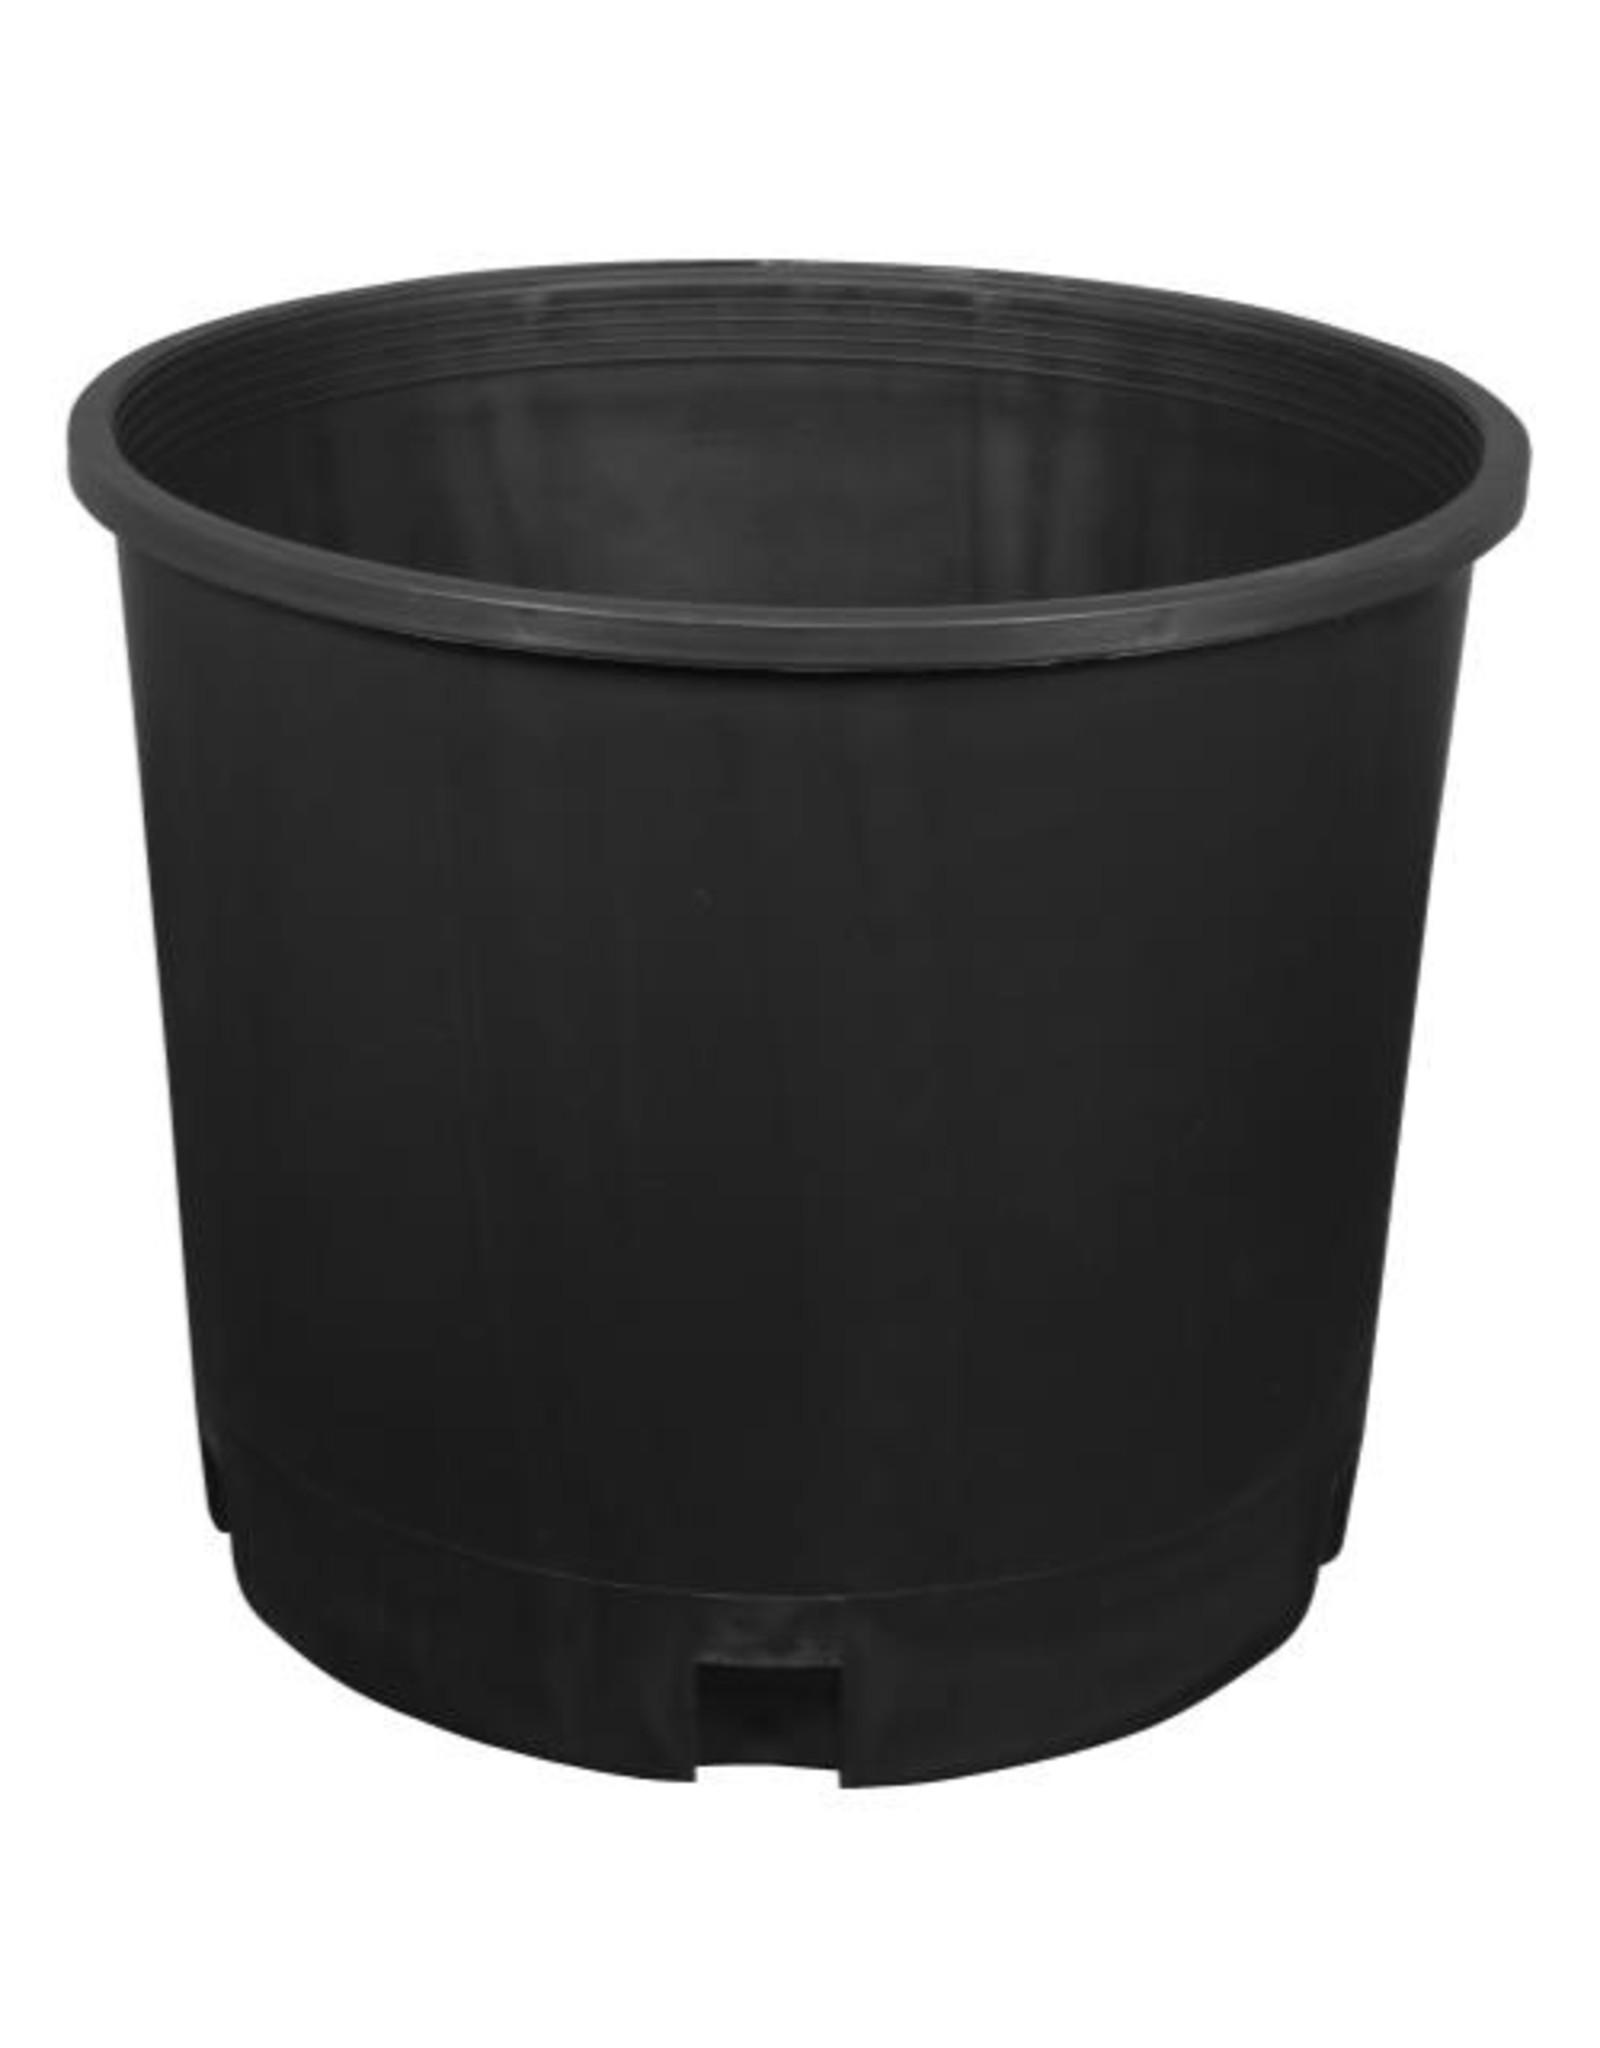 Nursery Pot Premium - 5 Gal